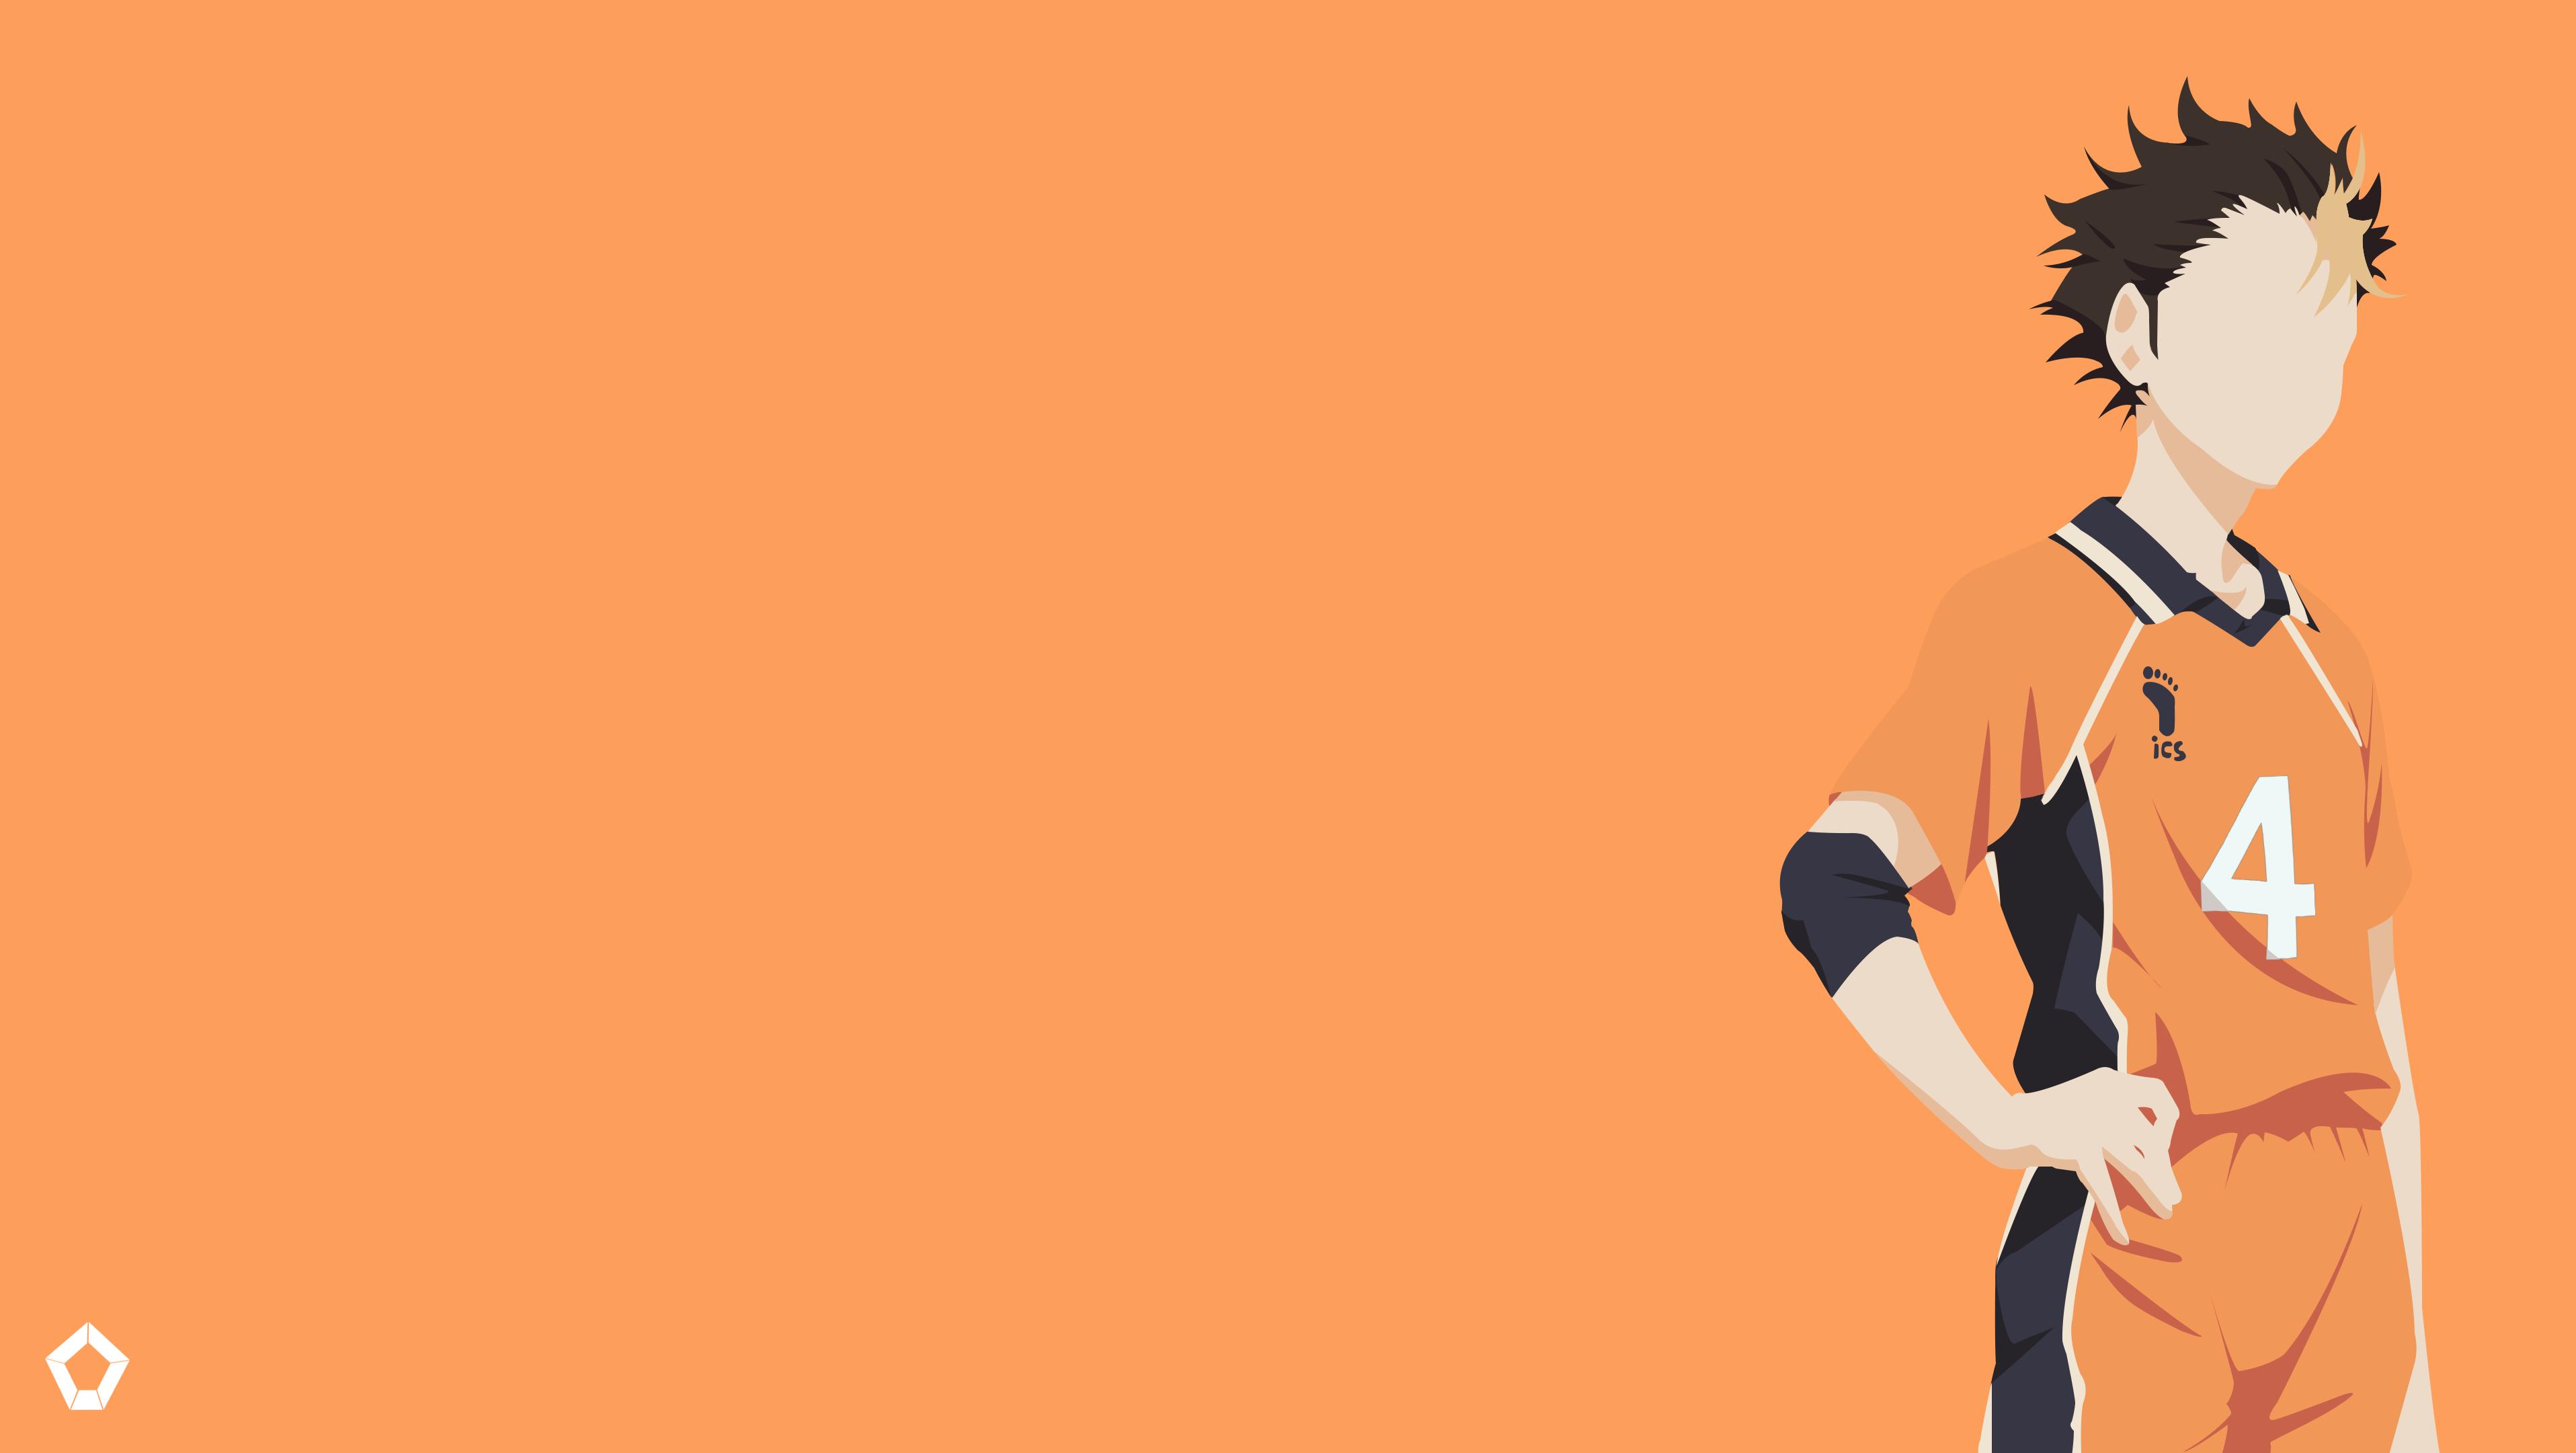 Anime Minimalist Wallpaper 4k - Gambarku